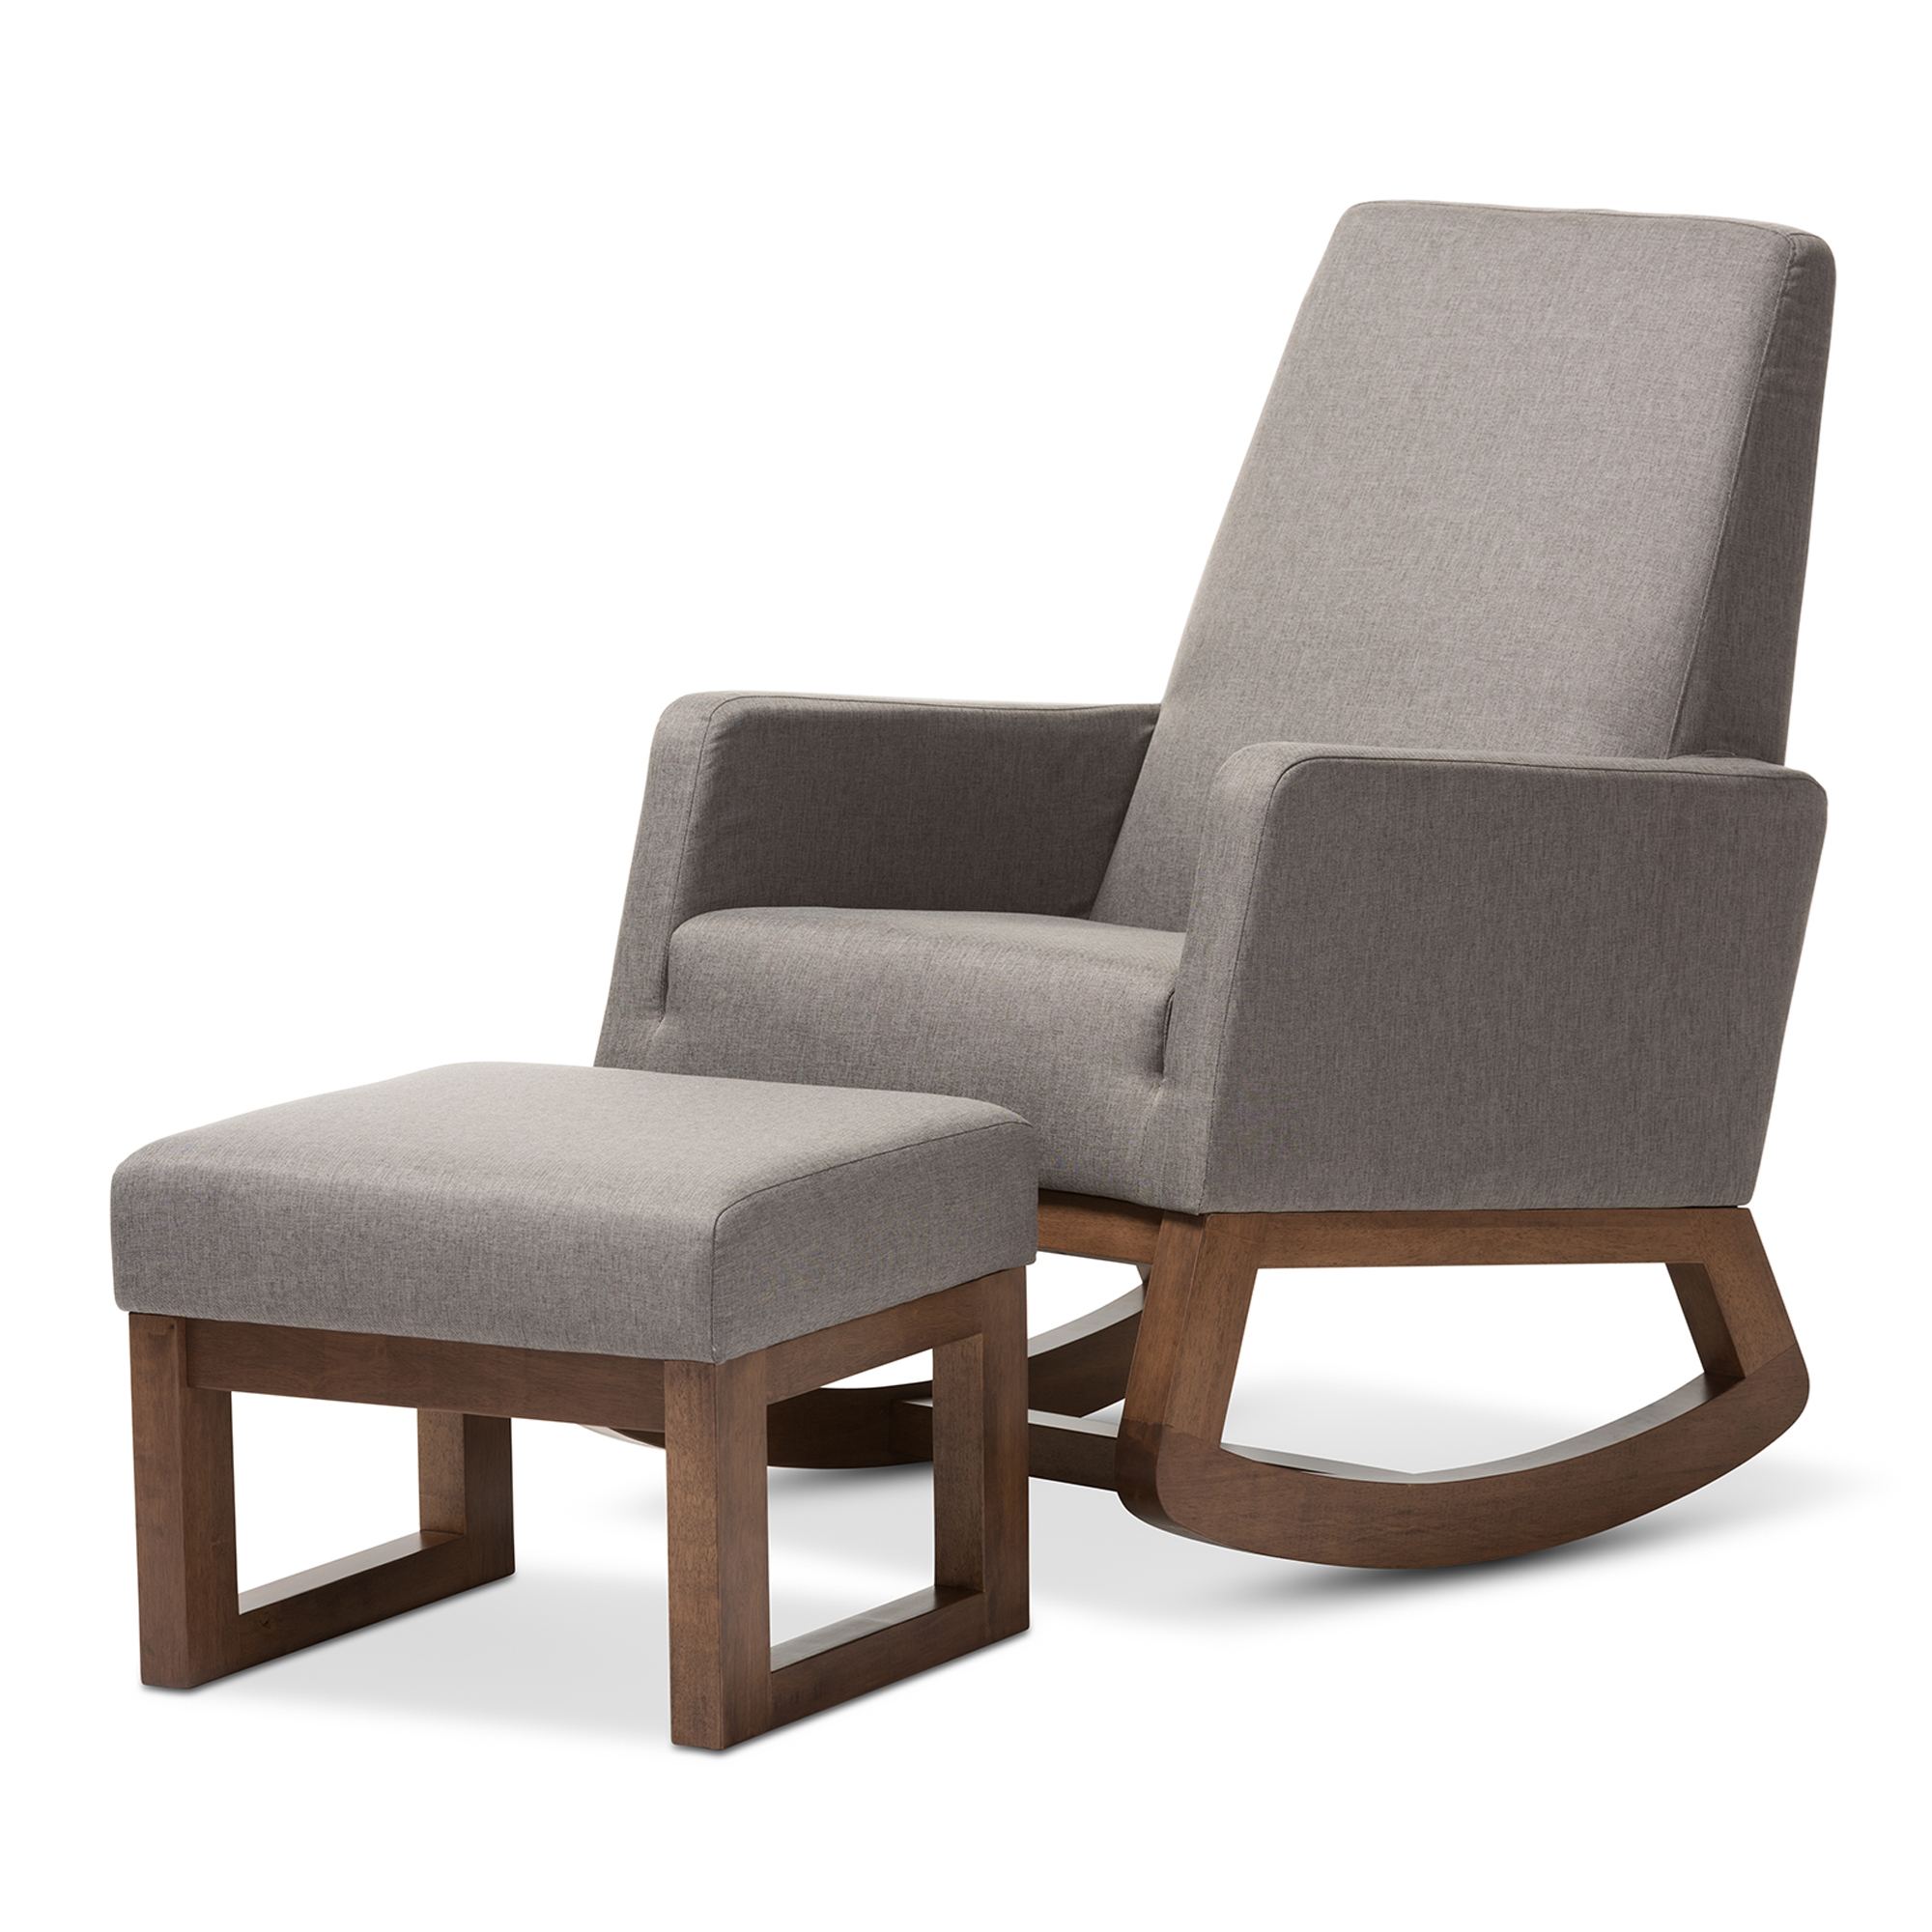 Baxton Studio Yashiya Mid Century Retro Modern Grey Fabric Upholstered  Rocking Chair And Ottoman Set Part 24